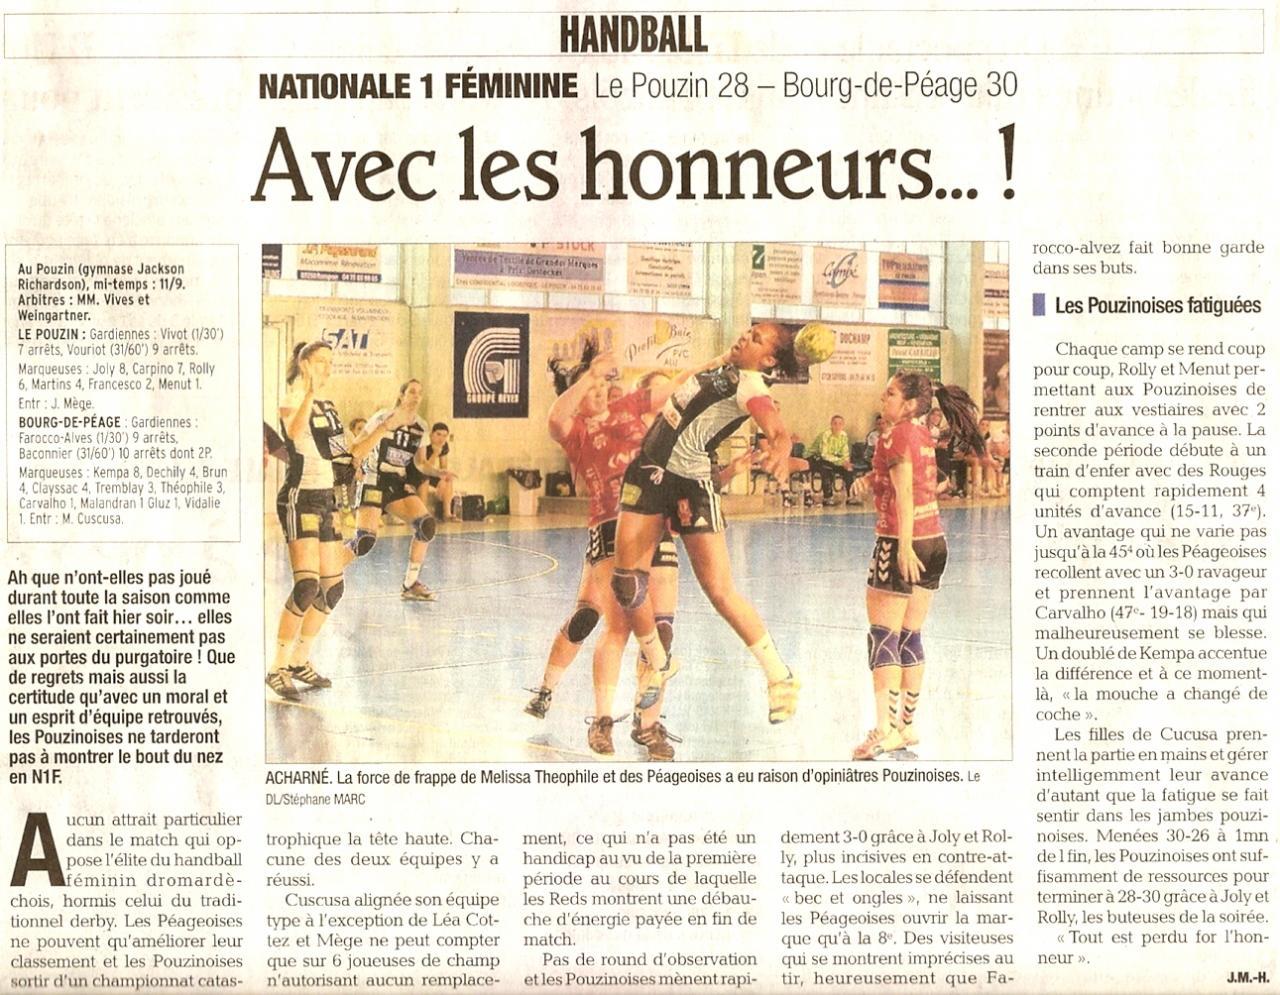 dl-sports-13-05-2012-1.jpg